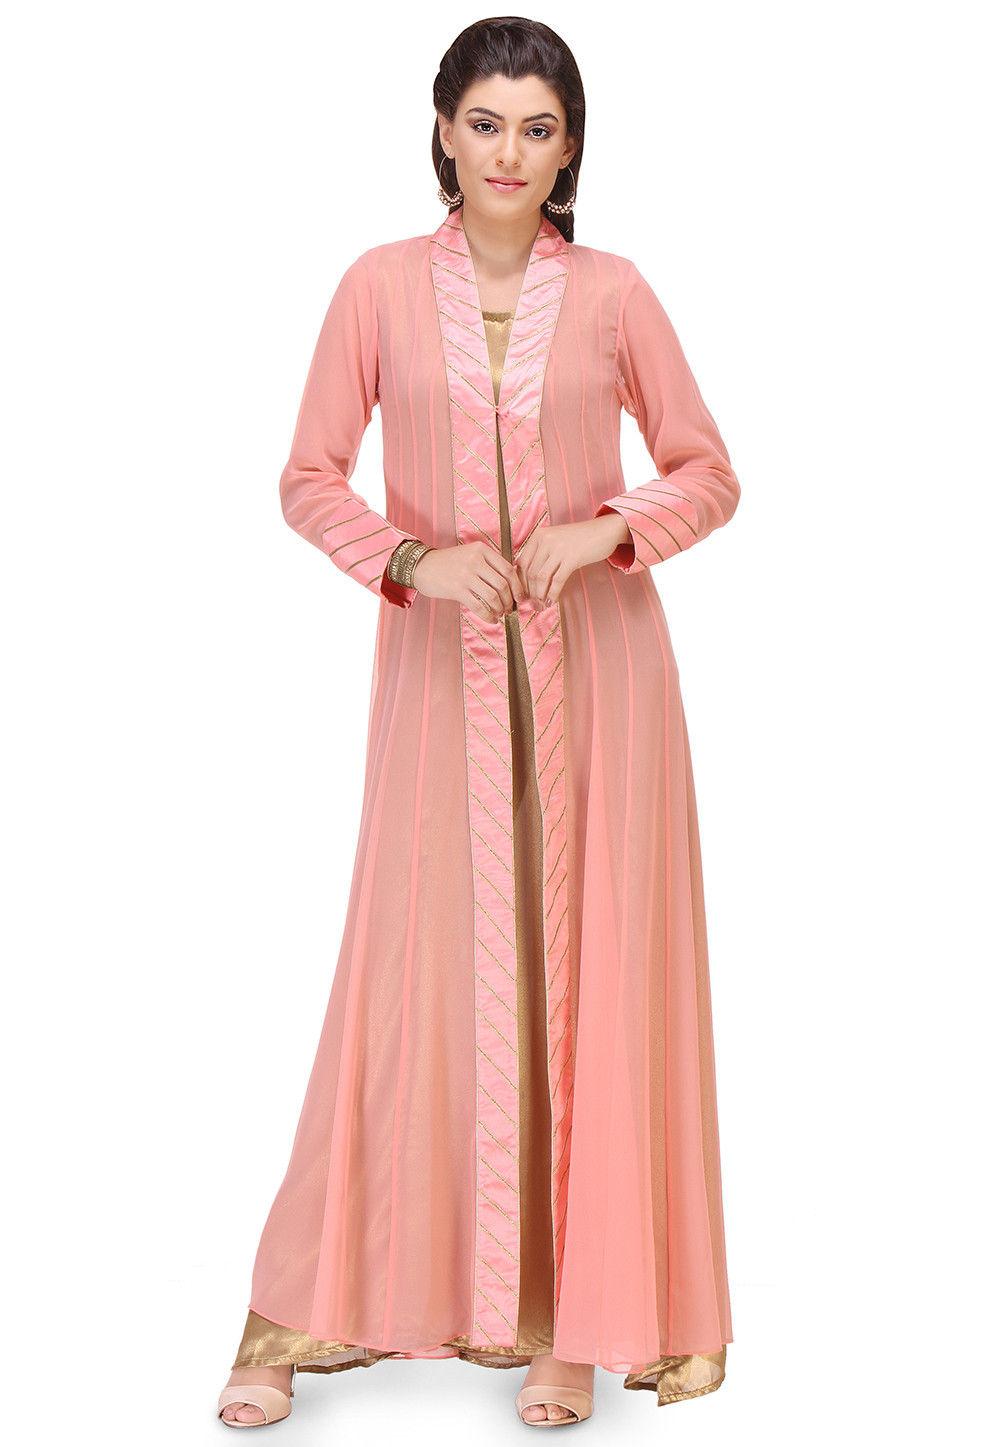 37697489d7 Indo Western Jackets for Women - Buy Latest Designs Online | Utsav ...